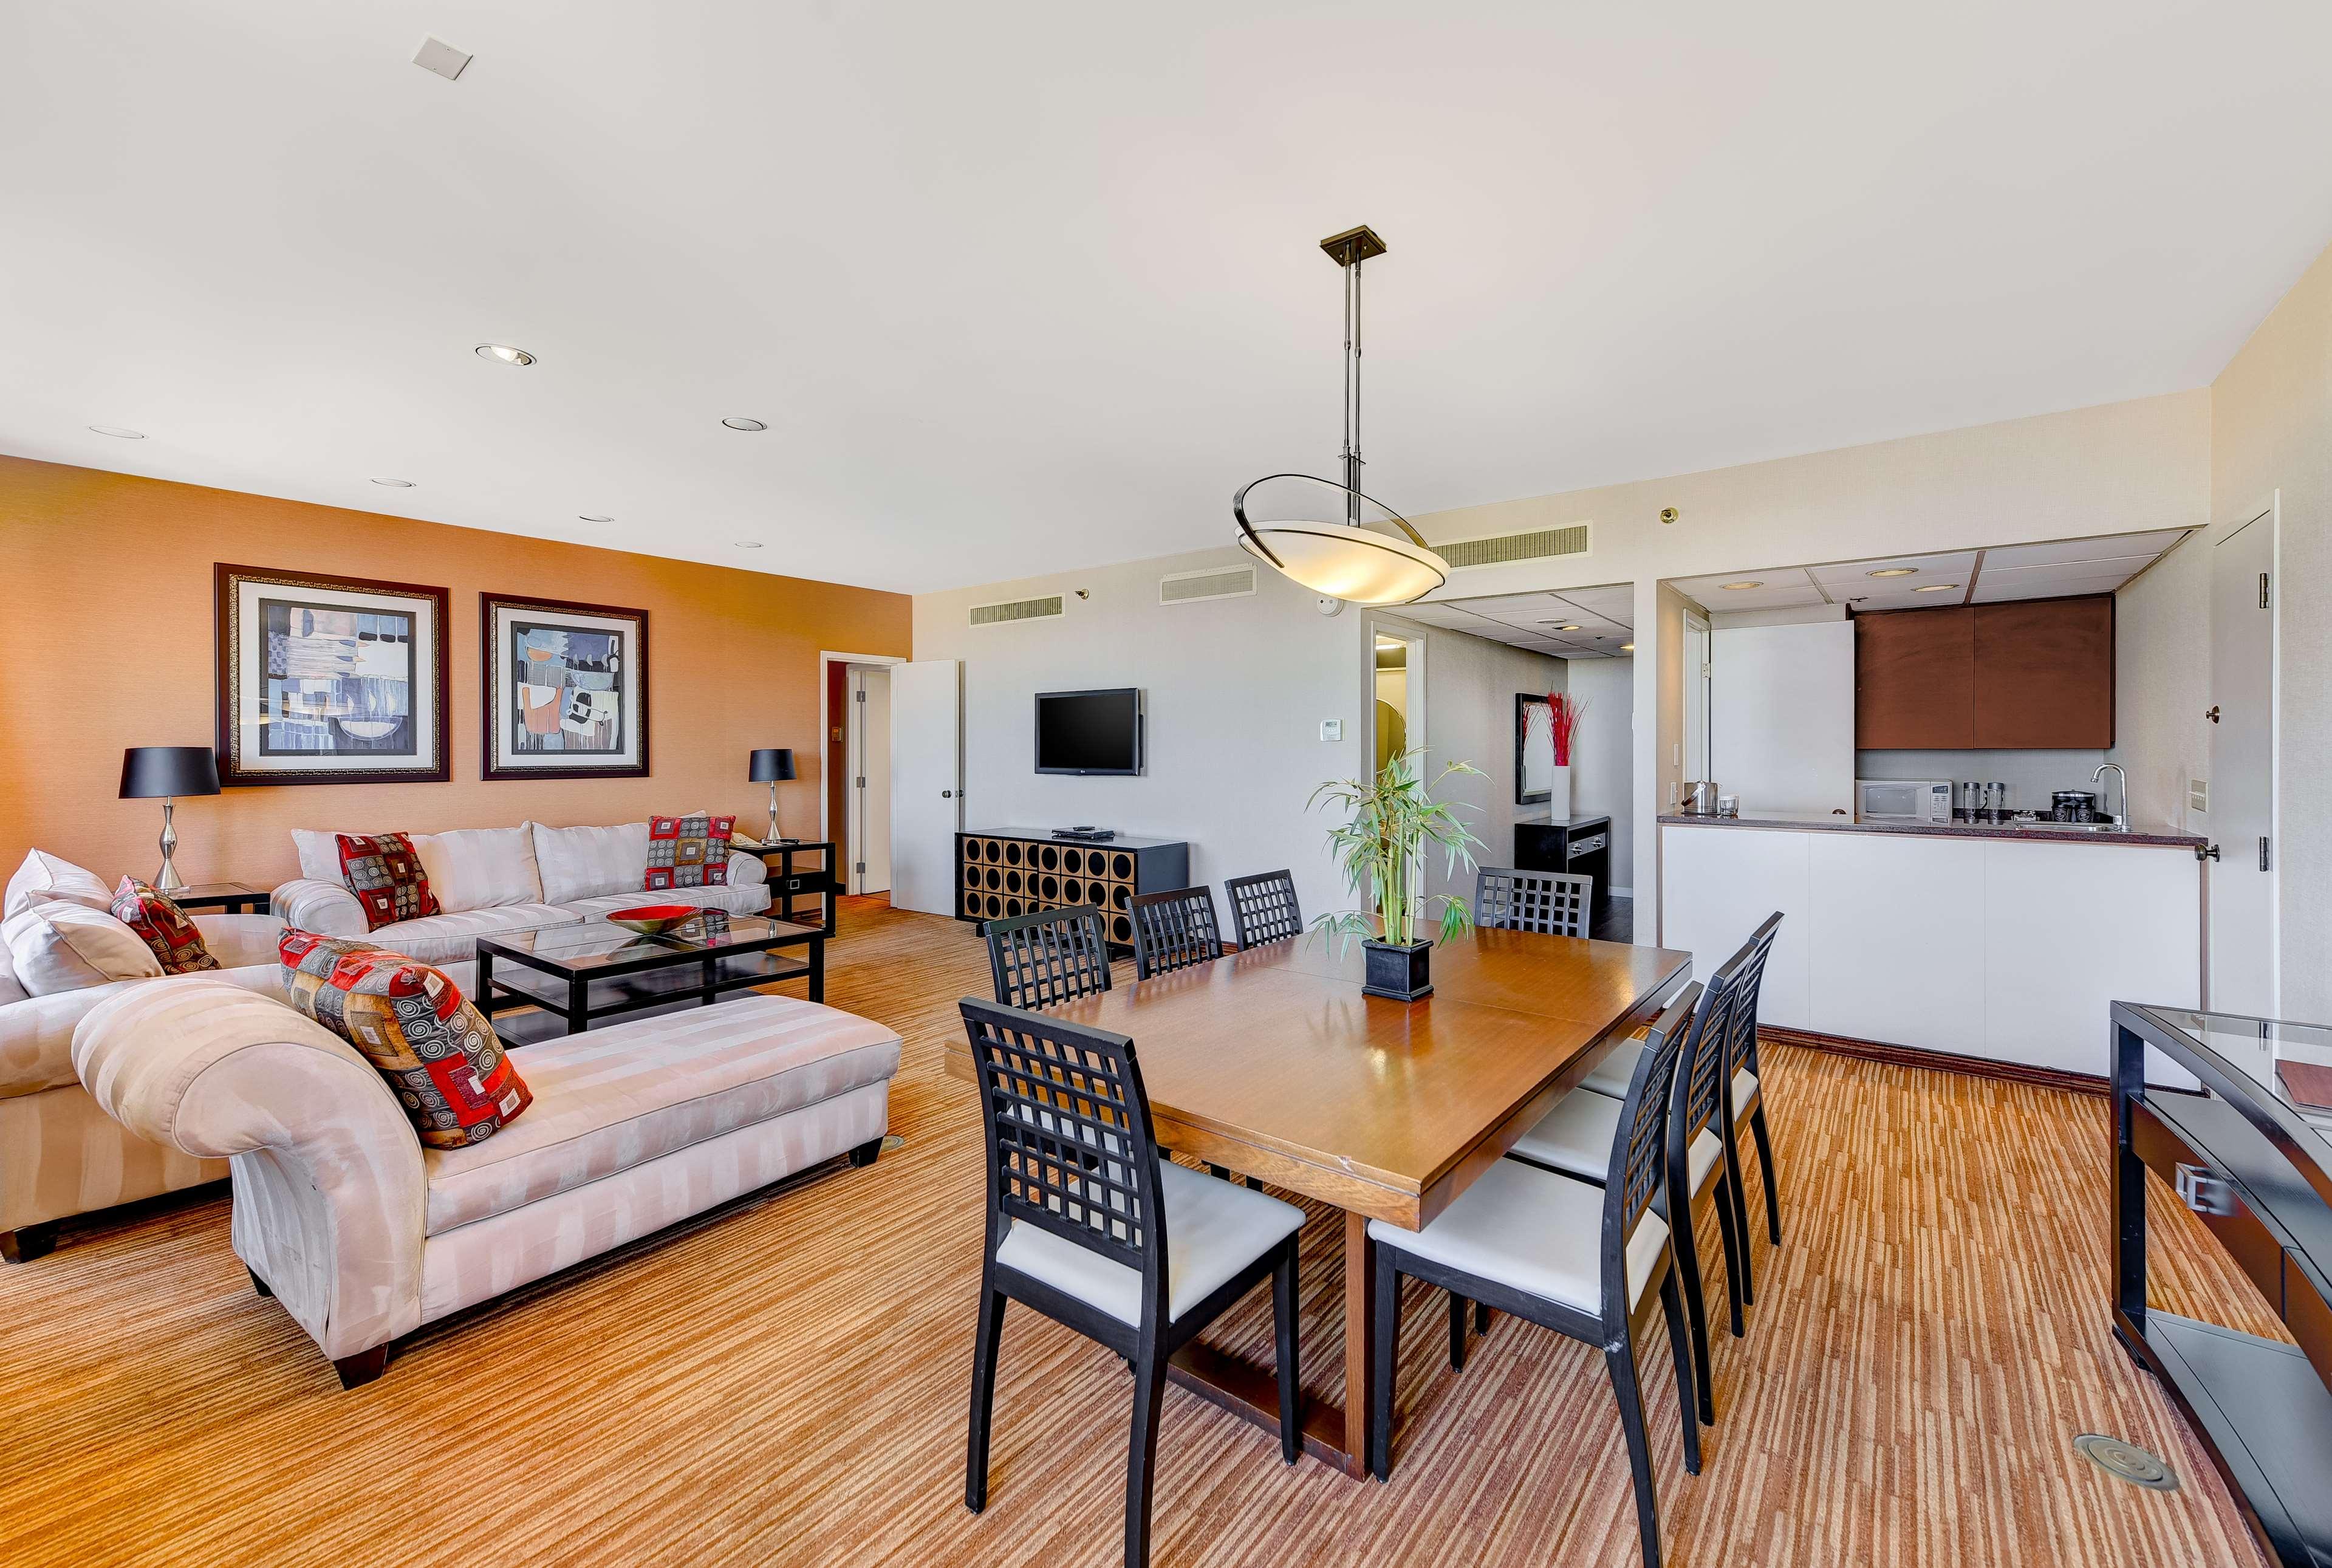 DoubleTree by Hilton Hotel Anaheim - Orange County image 46